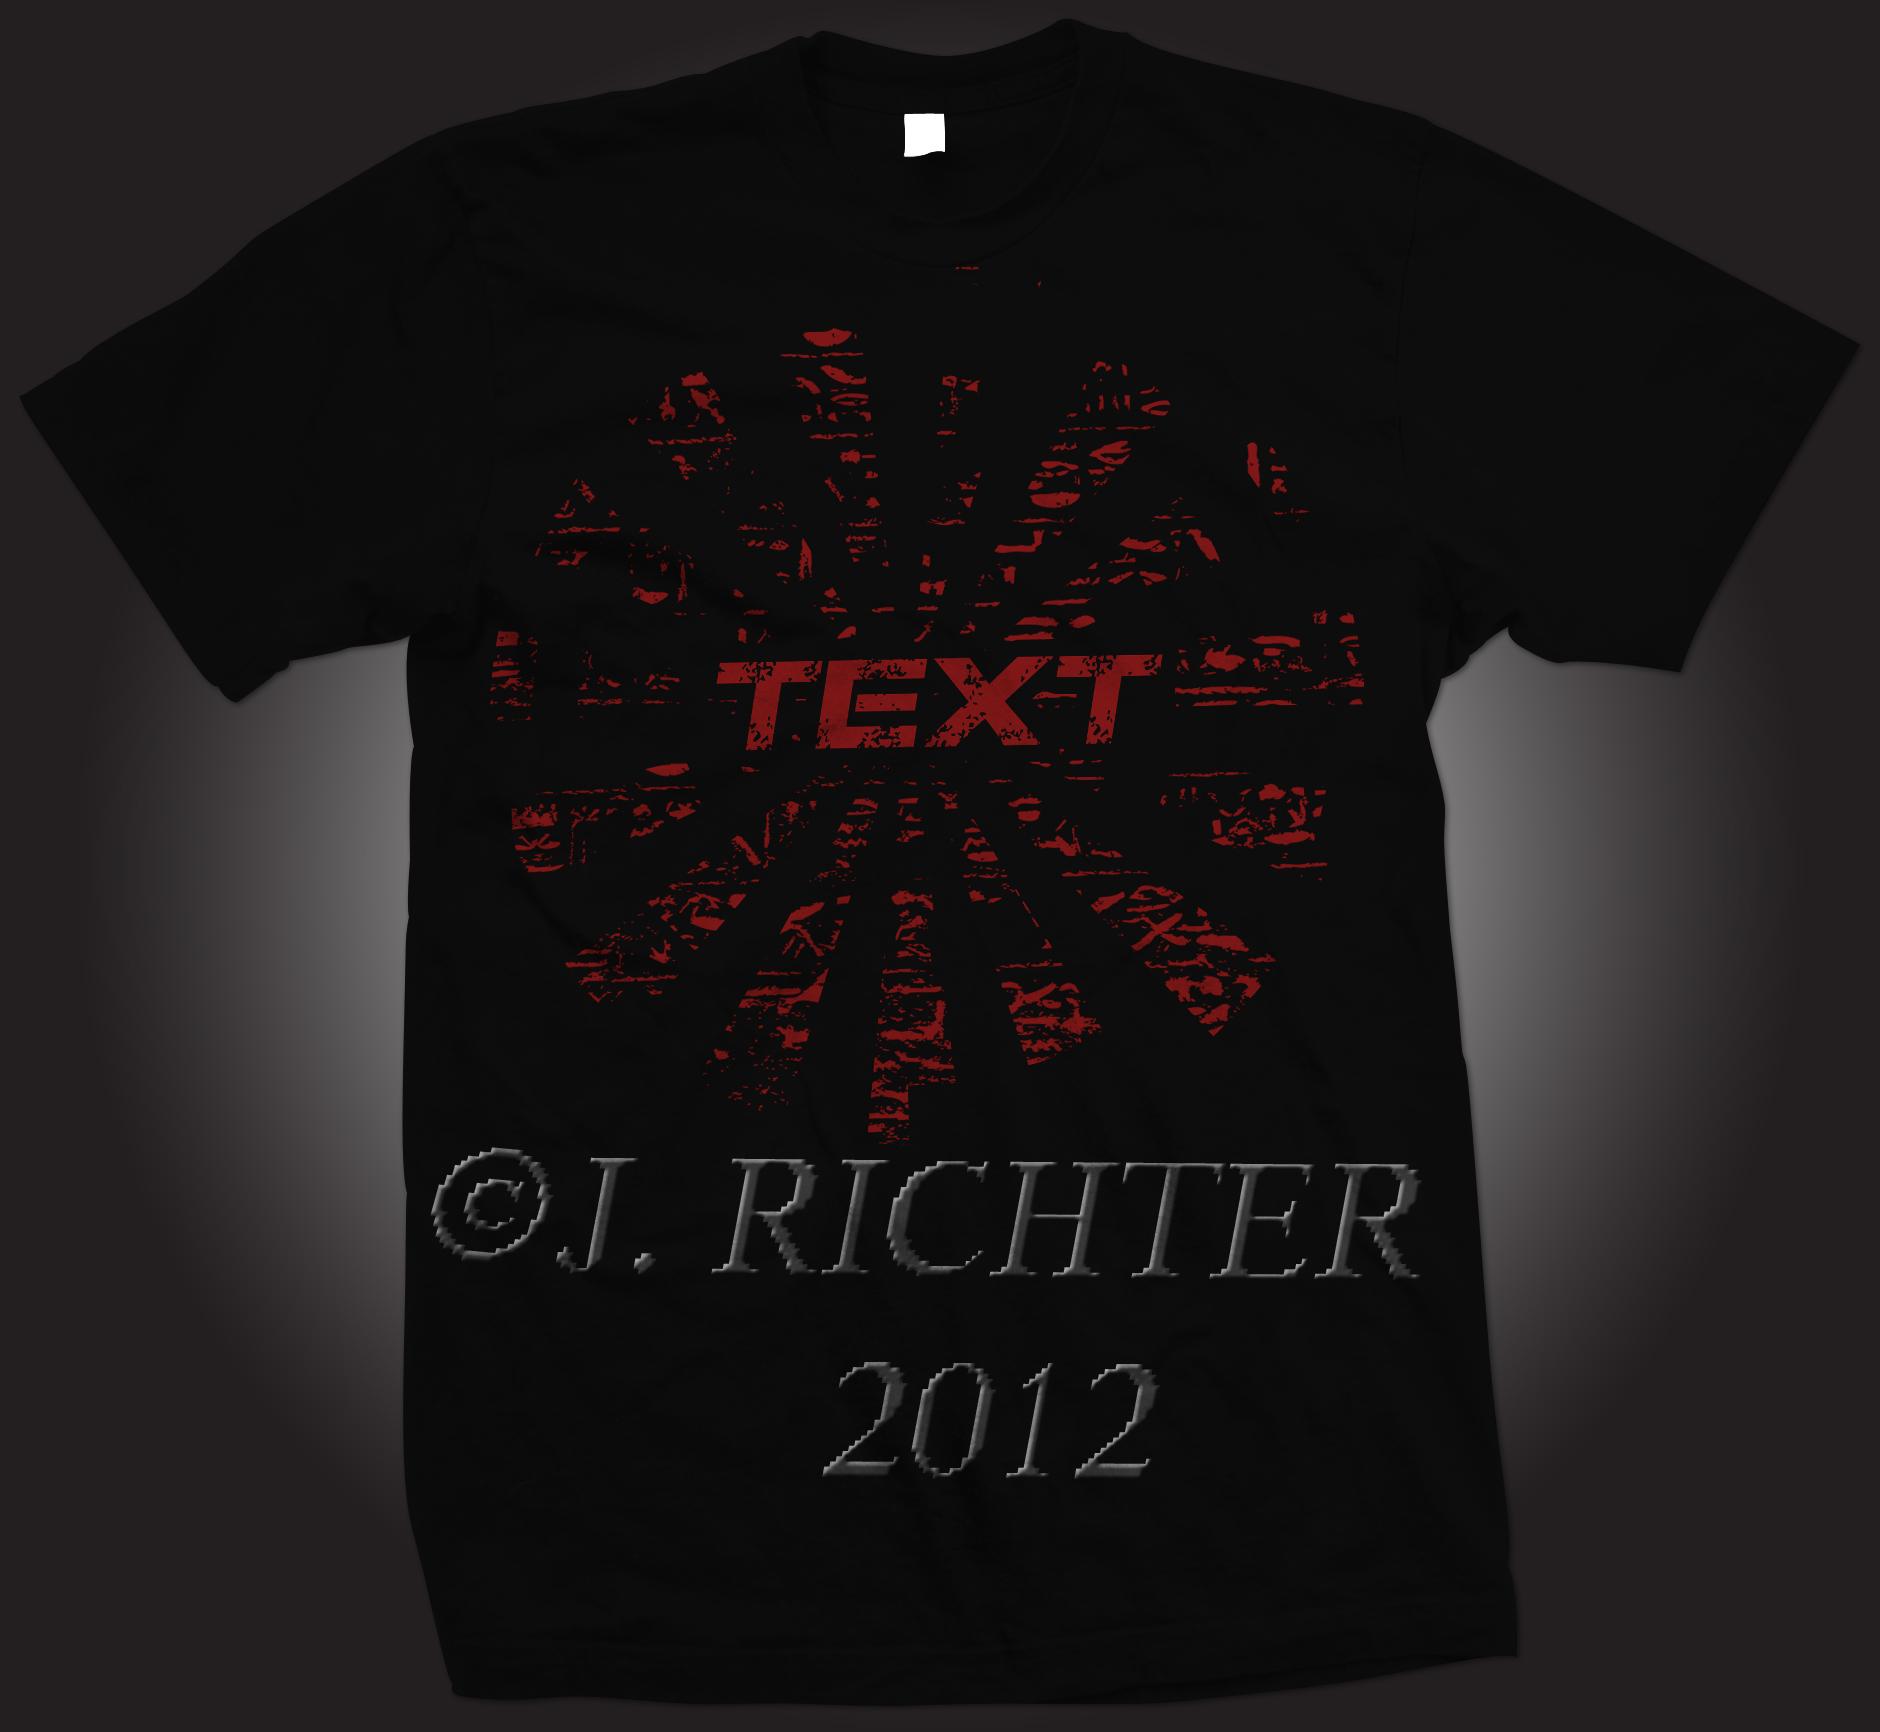 T shirt sample 3 by jmr designs on deviantart for T shirt sample design